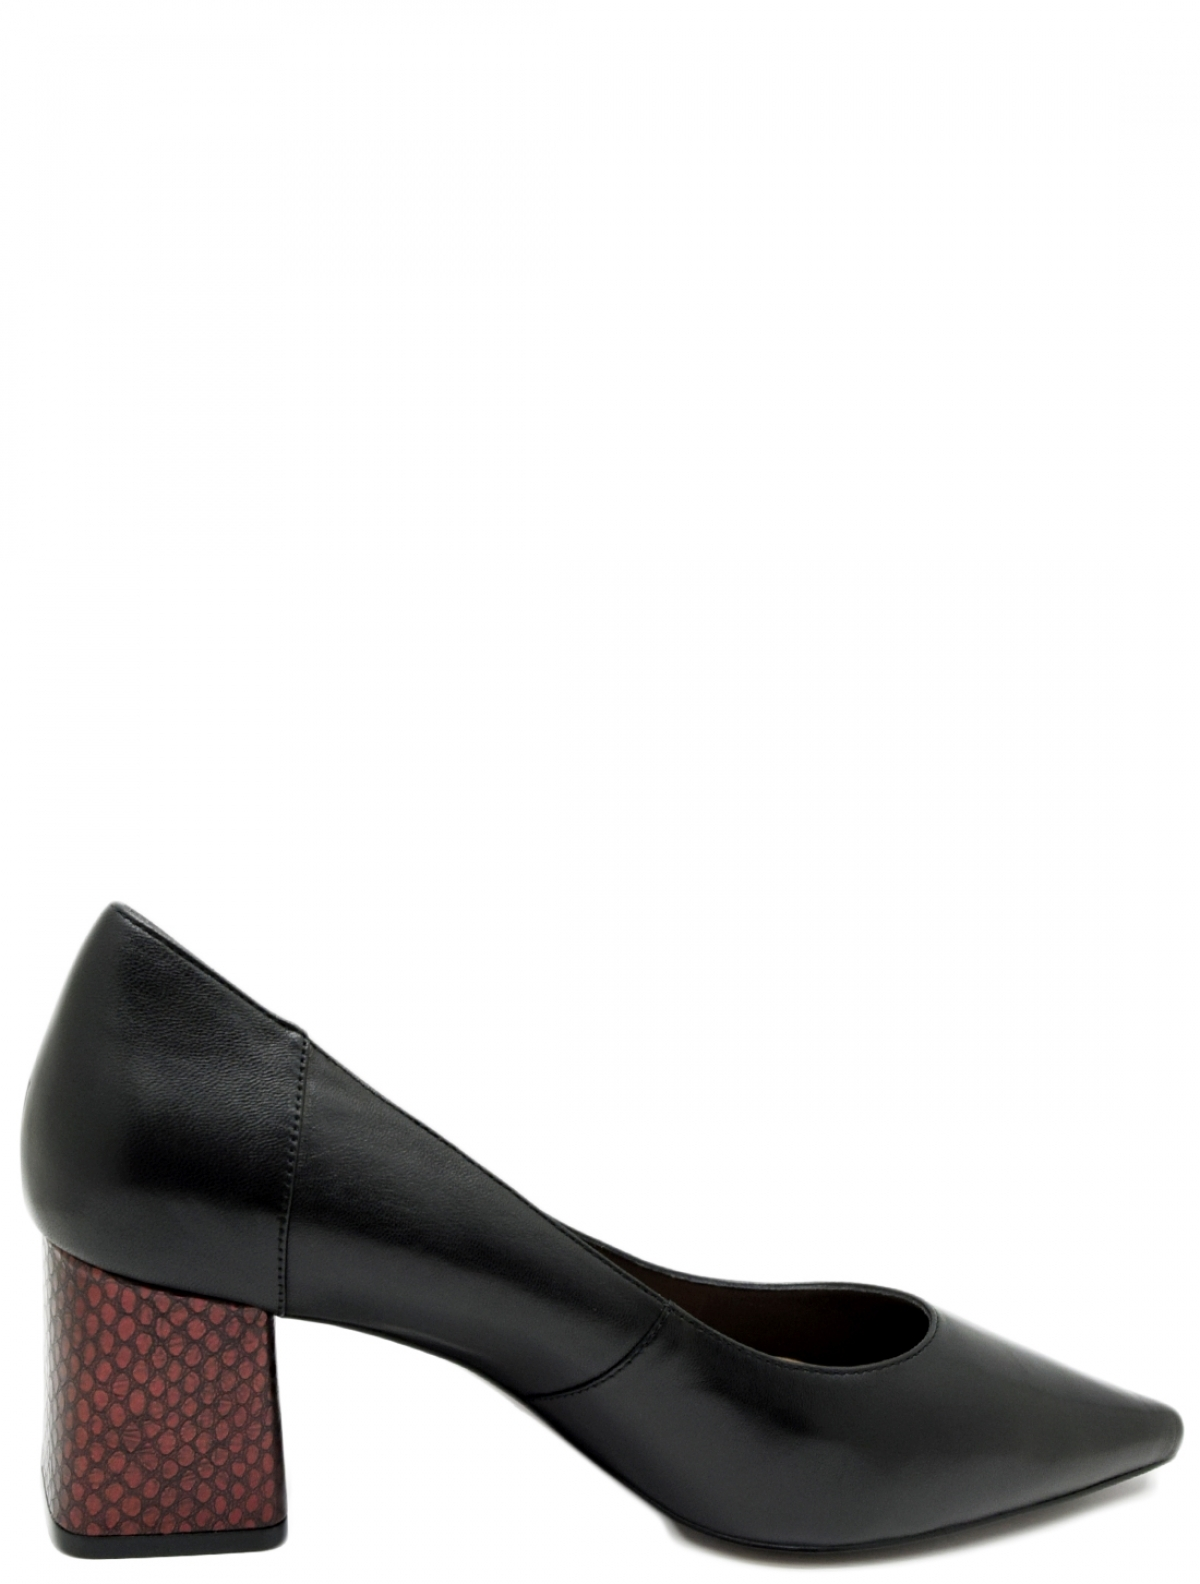 GRACIANA W3014-D10-1 женские туфли